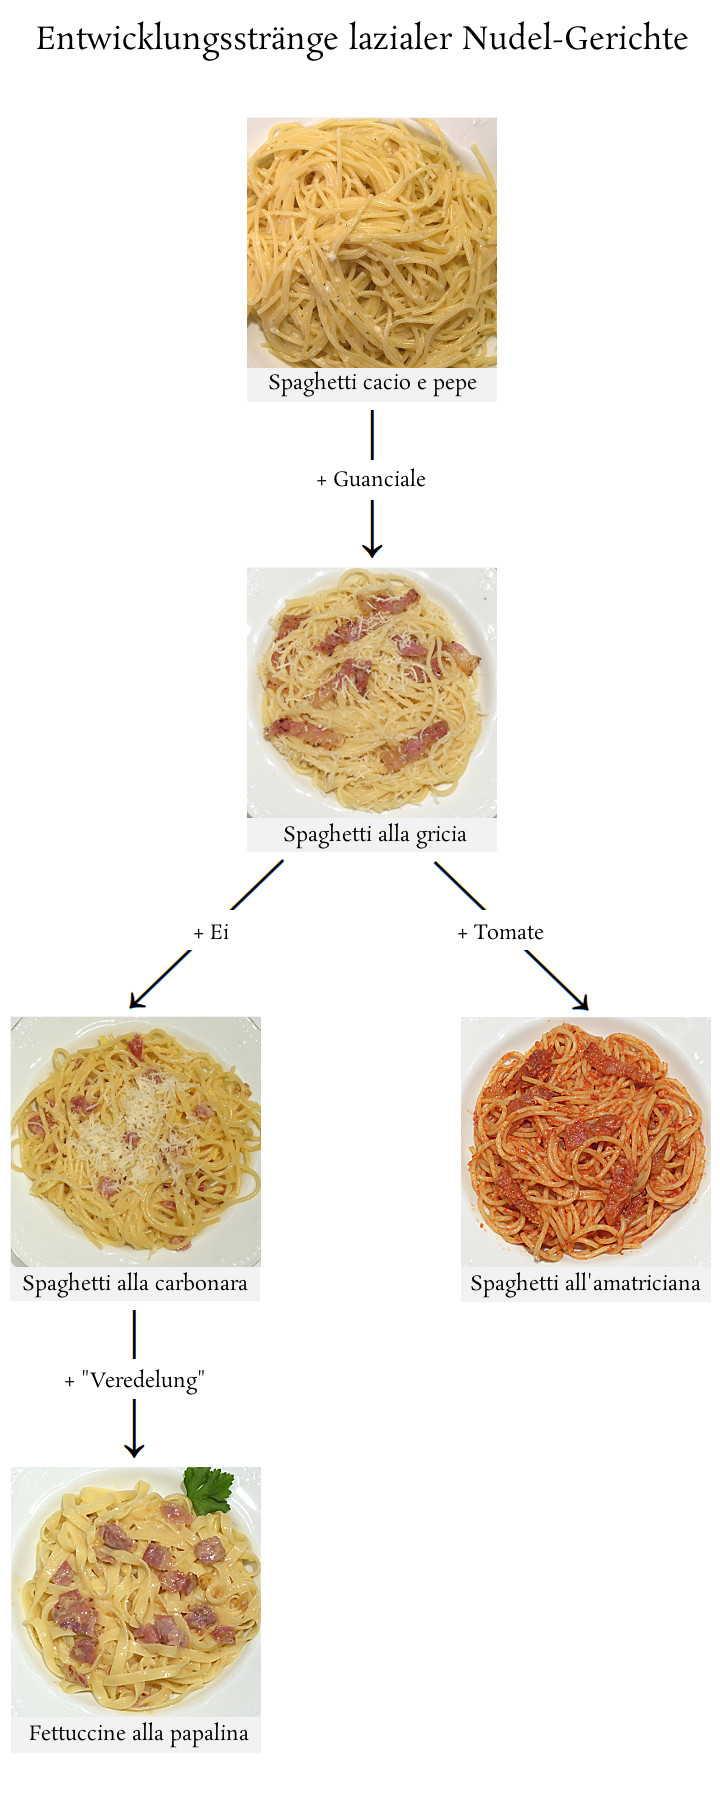 Lazio Nudelgerichte